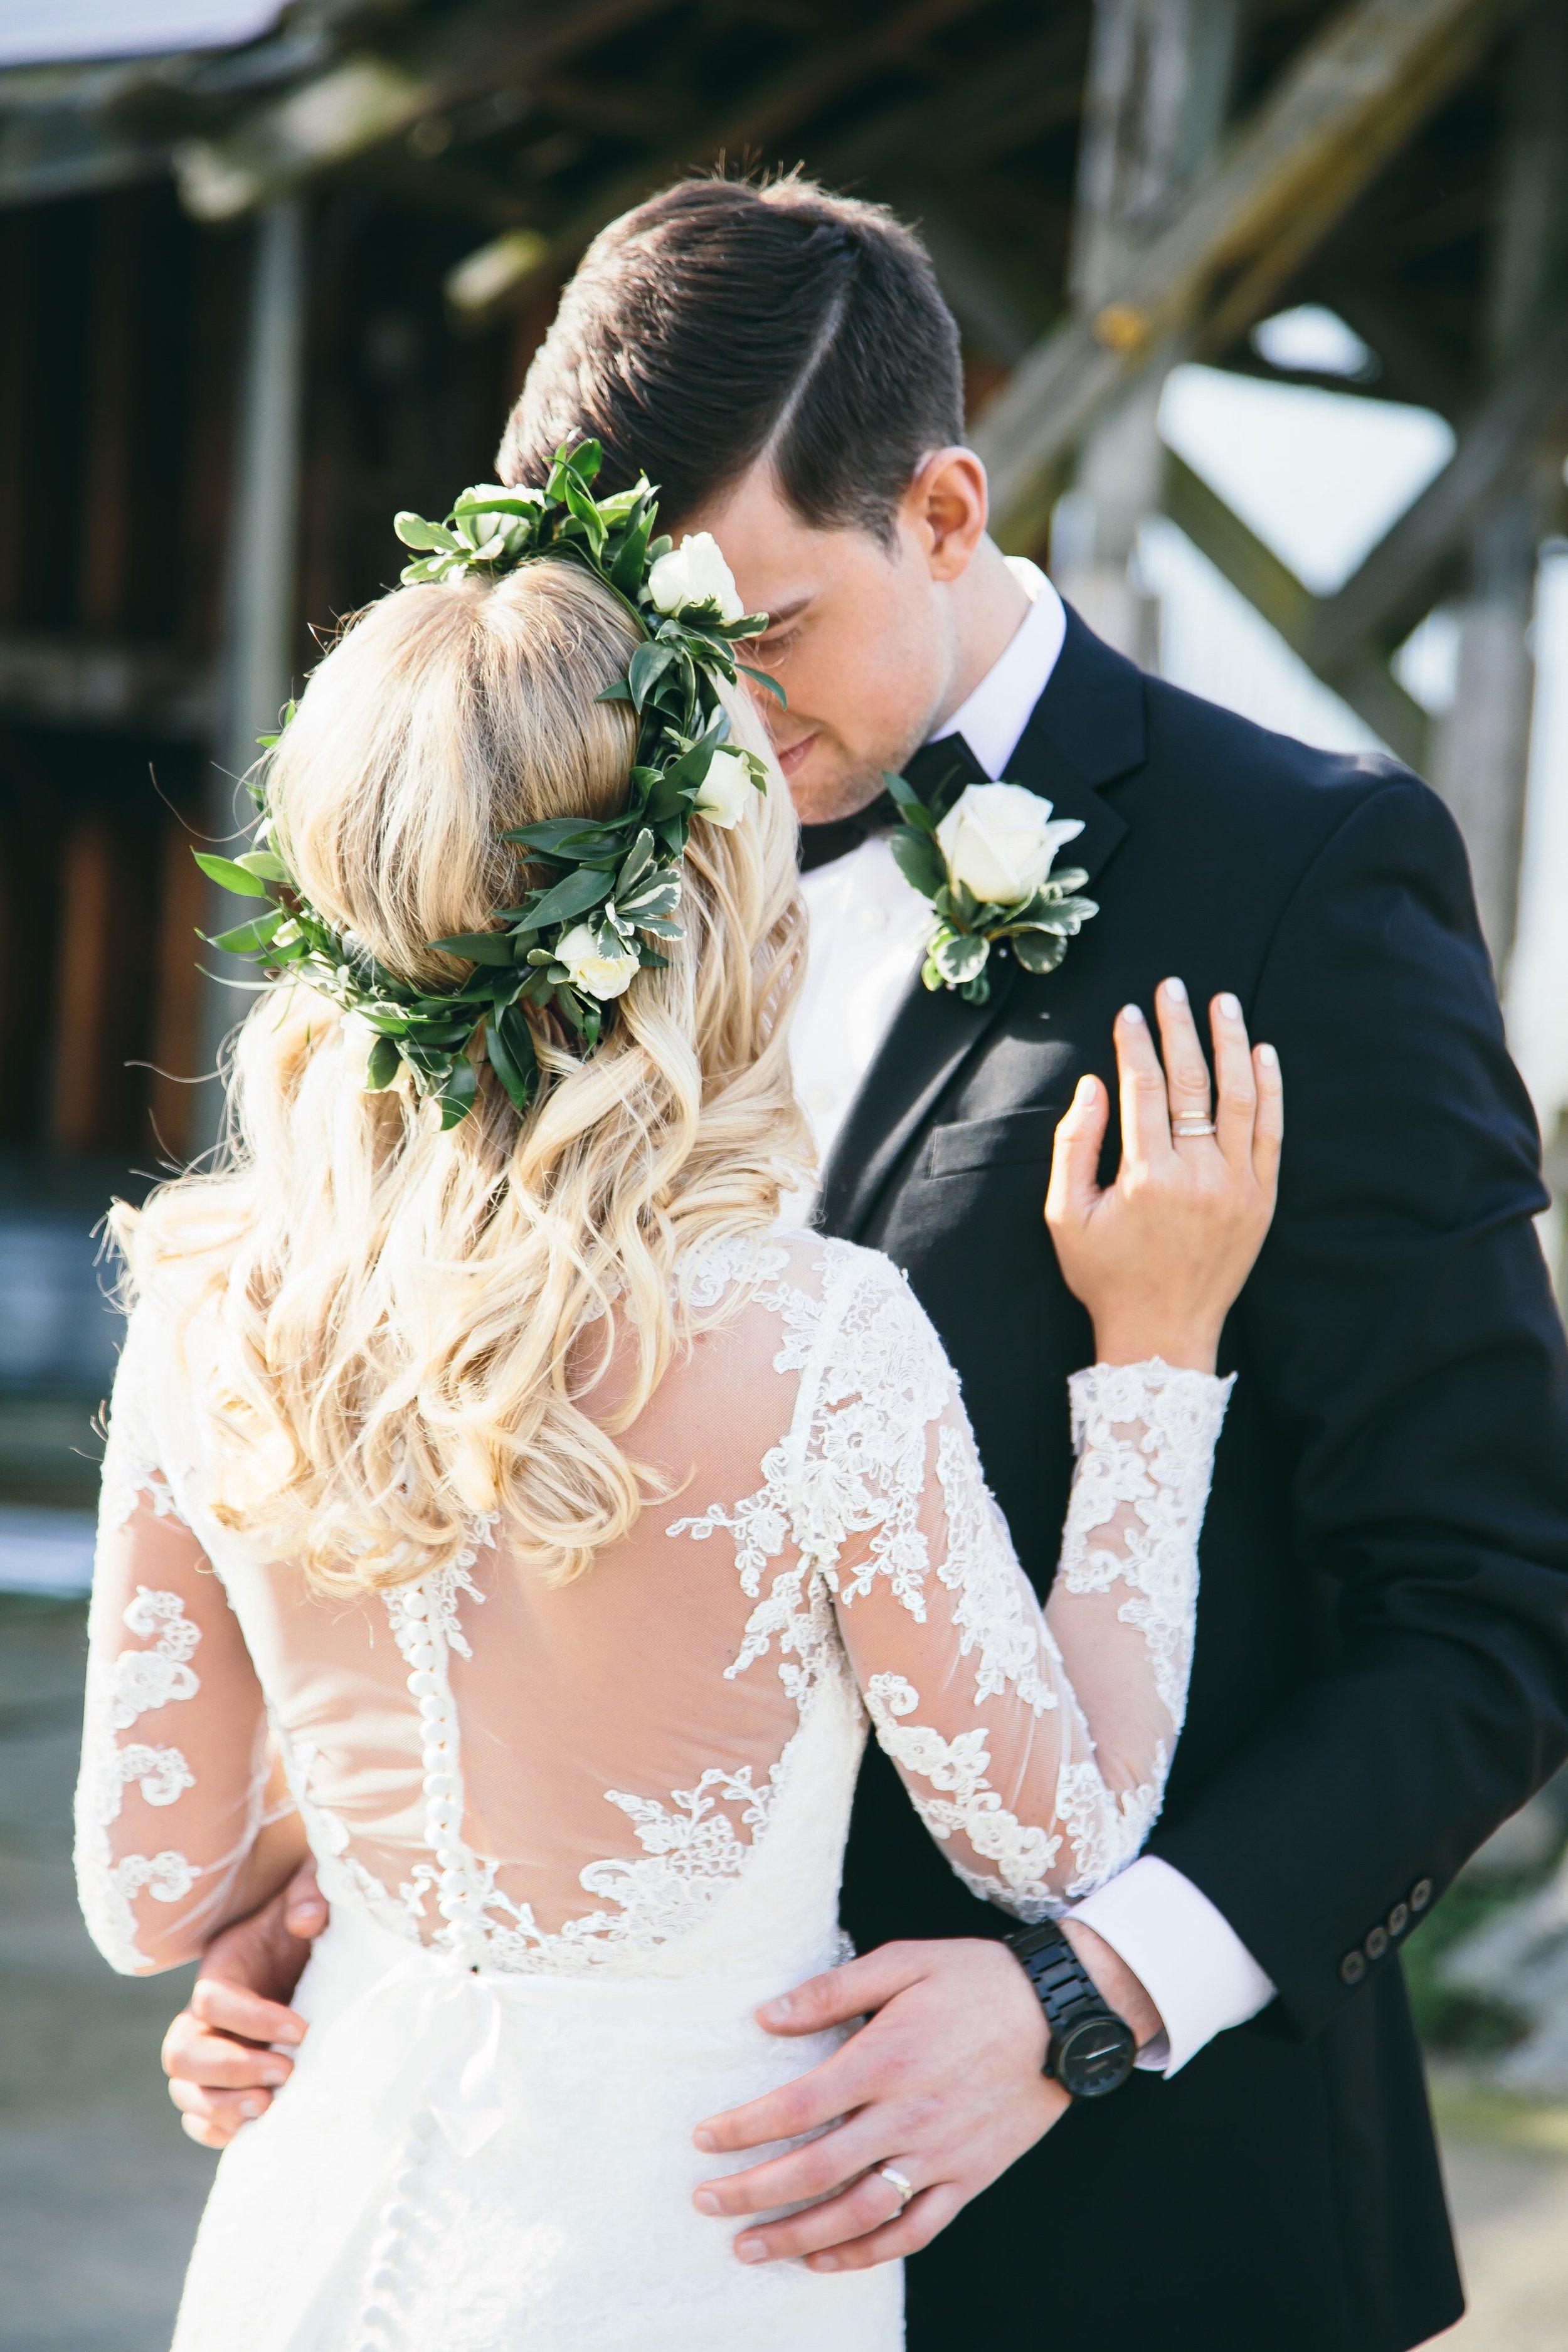 Bre Sheppard Wedding Dress - How To Find The Perfect Dress - Essense of Austraila Long Sleeve Dress.JPG